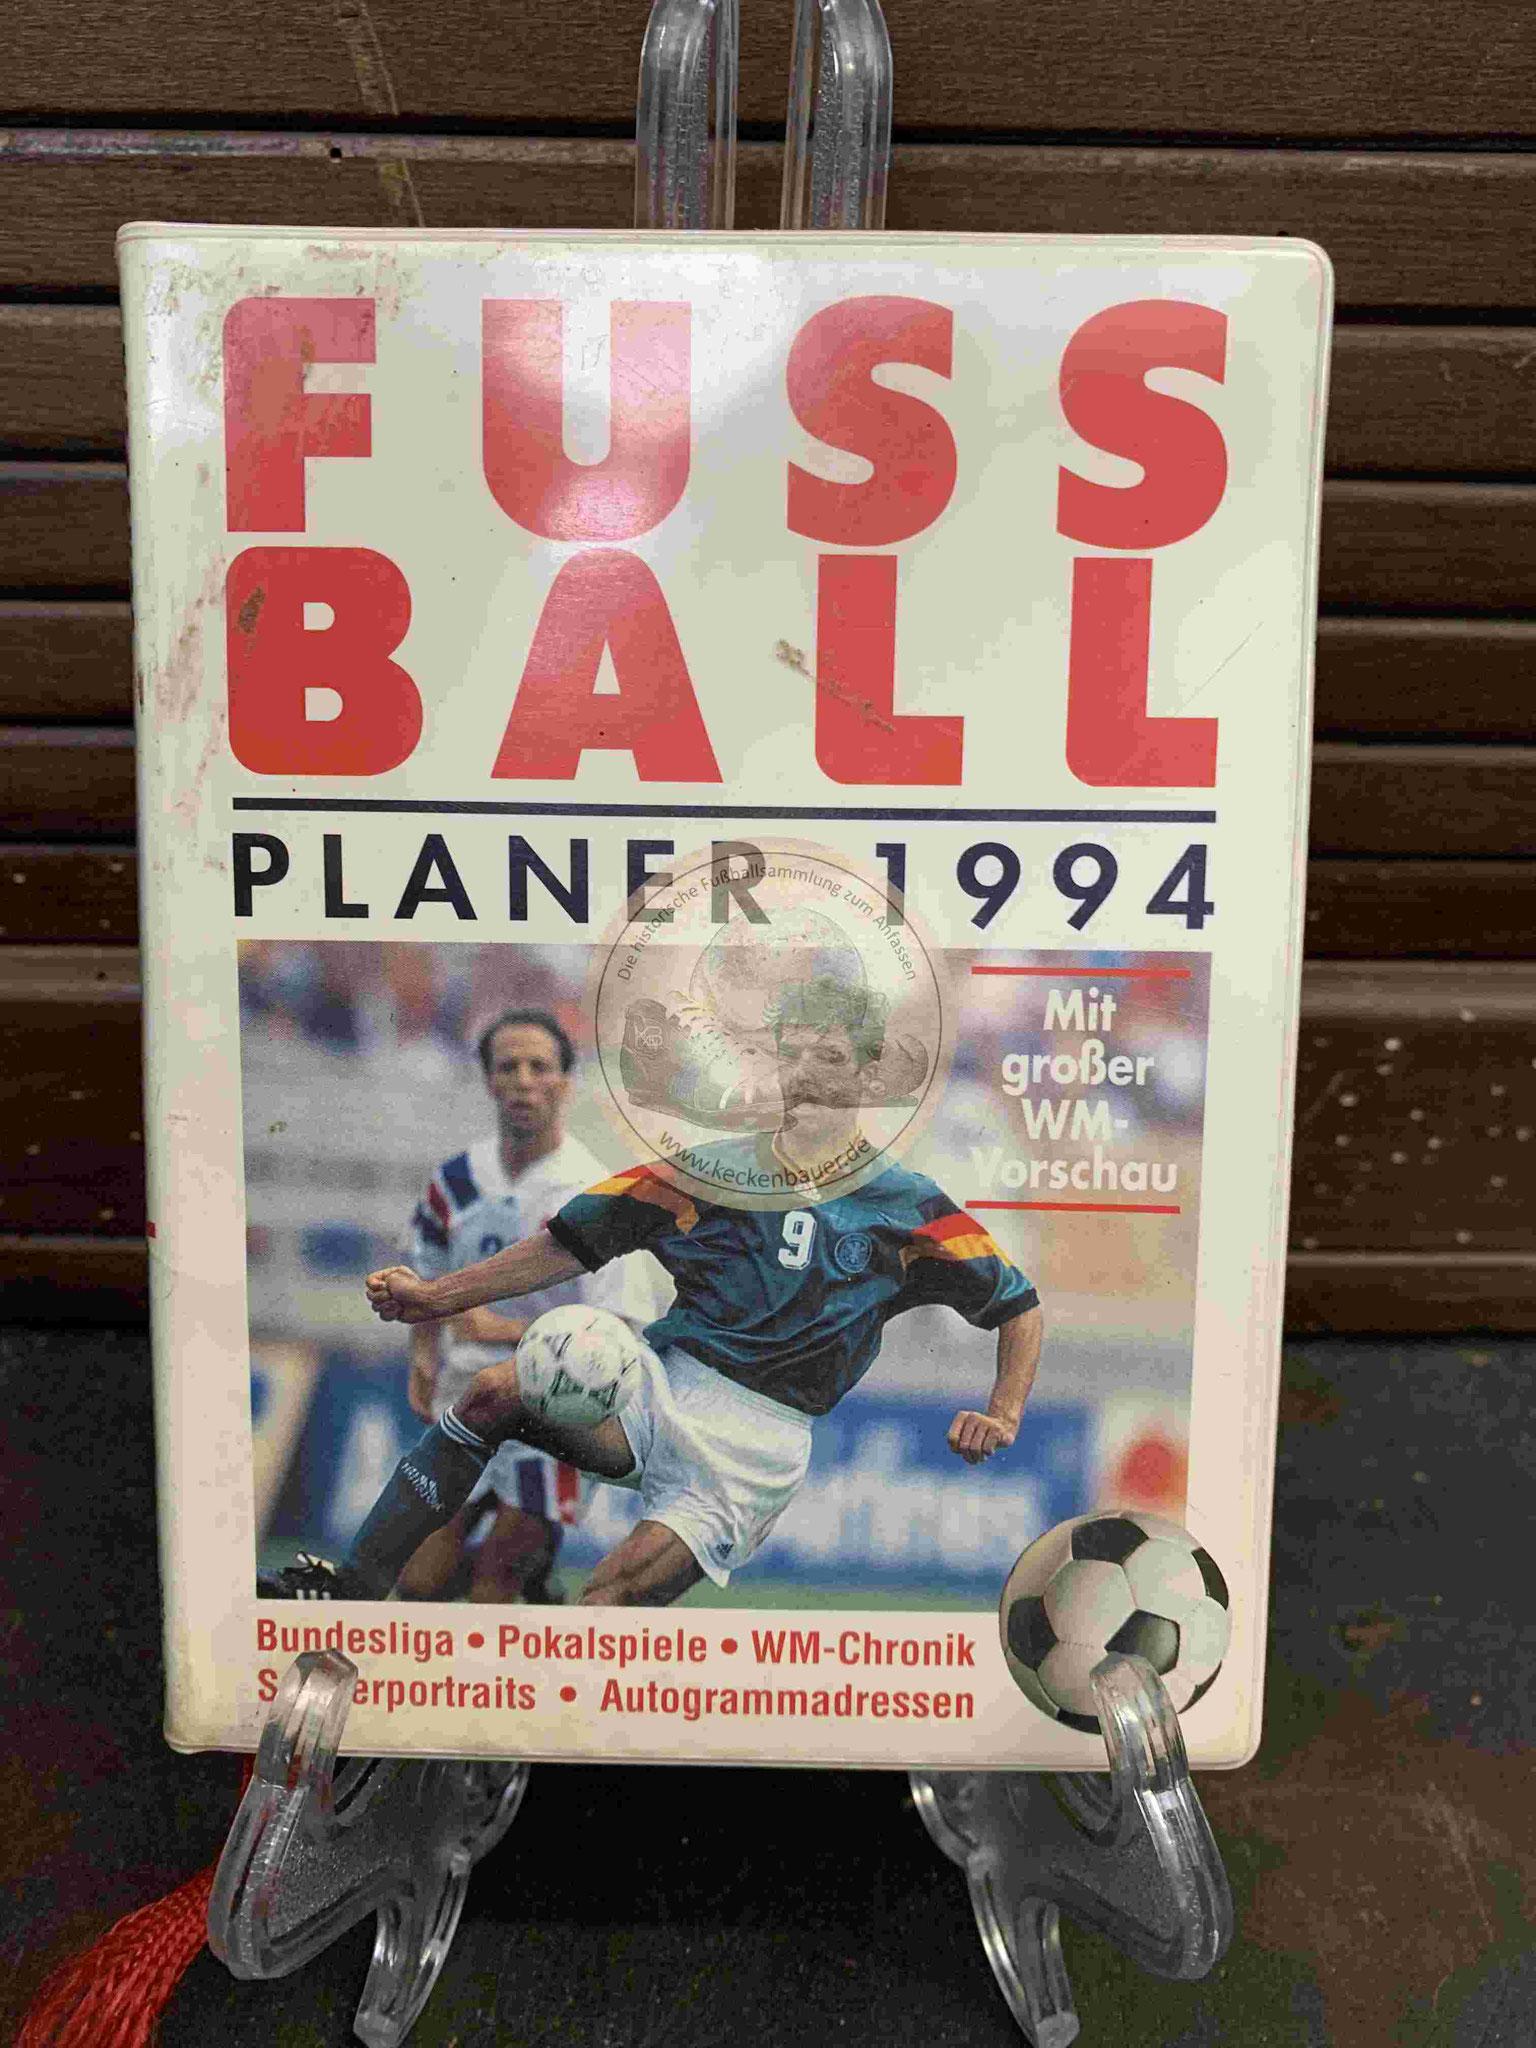 Fußball Planer 1994